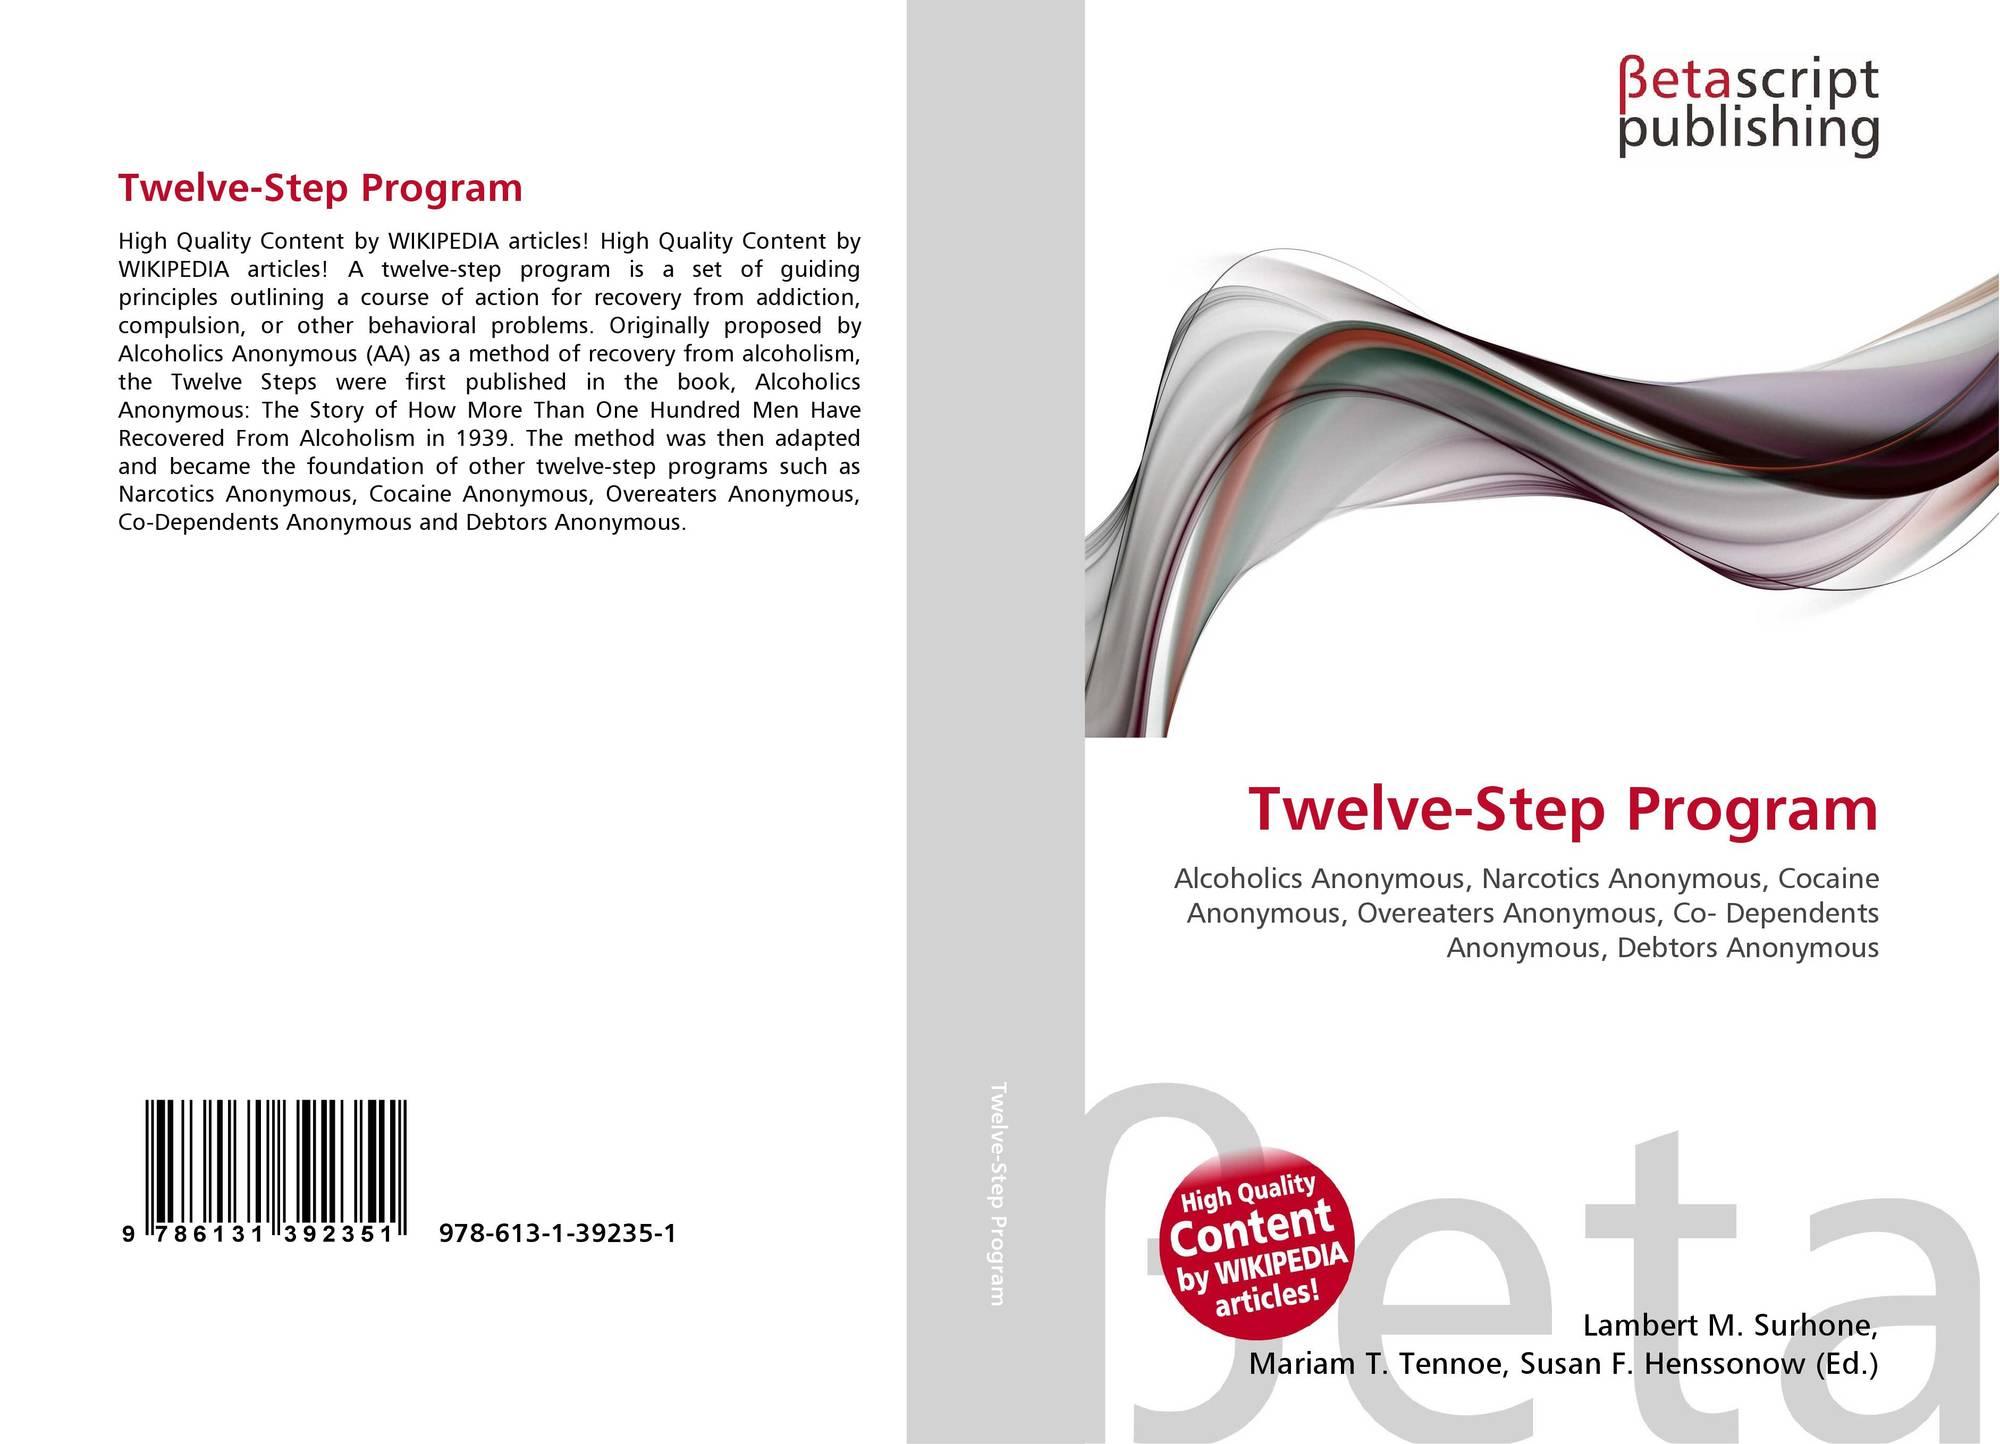 12 step program The ridge uses a 12-step program, a set of guiding principles, to help patients through drug and alcohol rehabilitation.